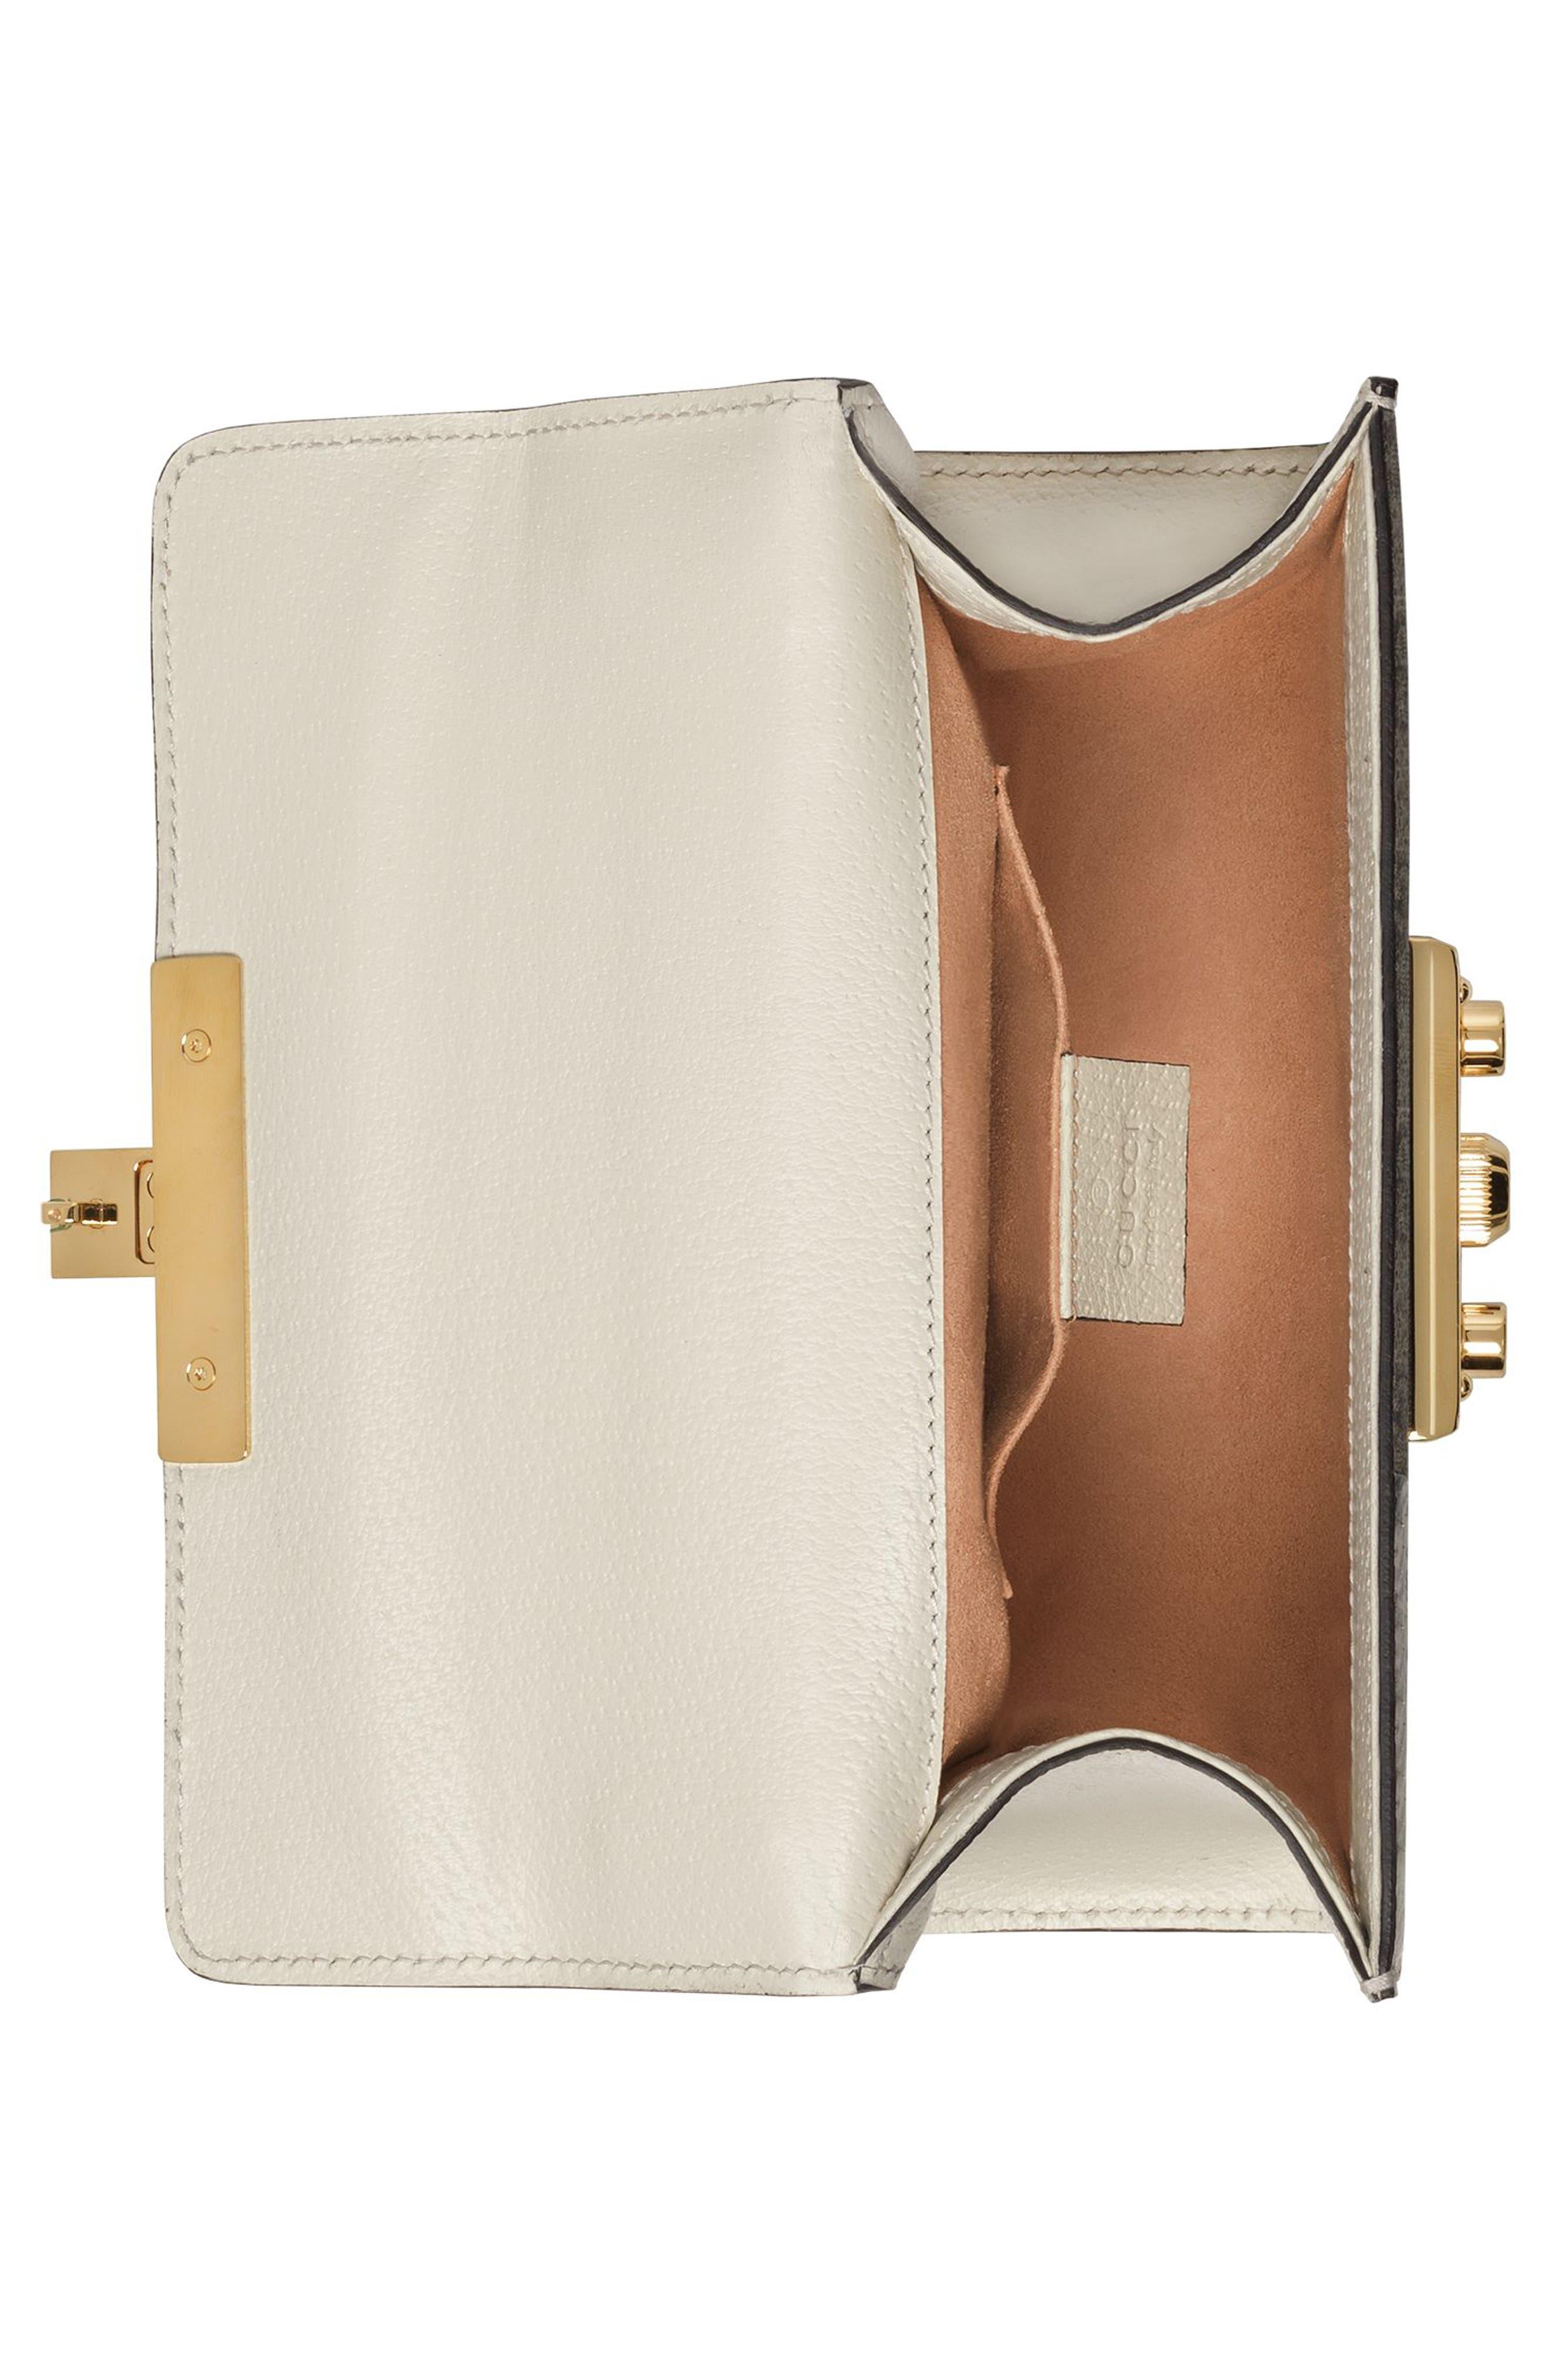 Small Padlock GG Supreme Wave Shoulder Bag with Genuine Snakeskin Trim,                             Alternate thumbnail 3, color,                             White/ Roccia/ Beige Ebony